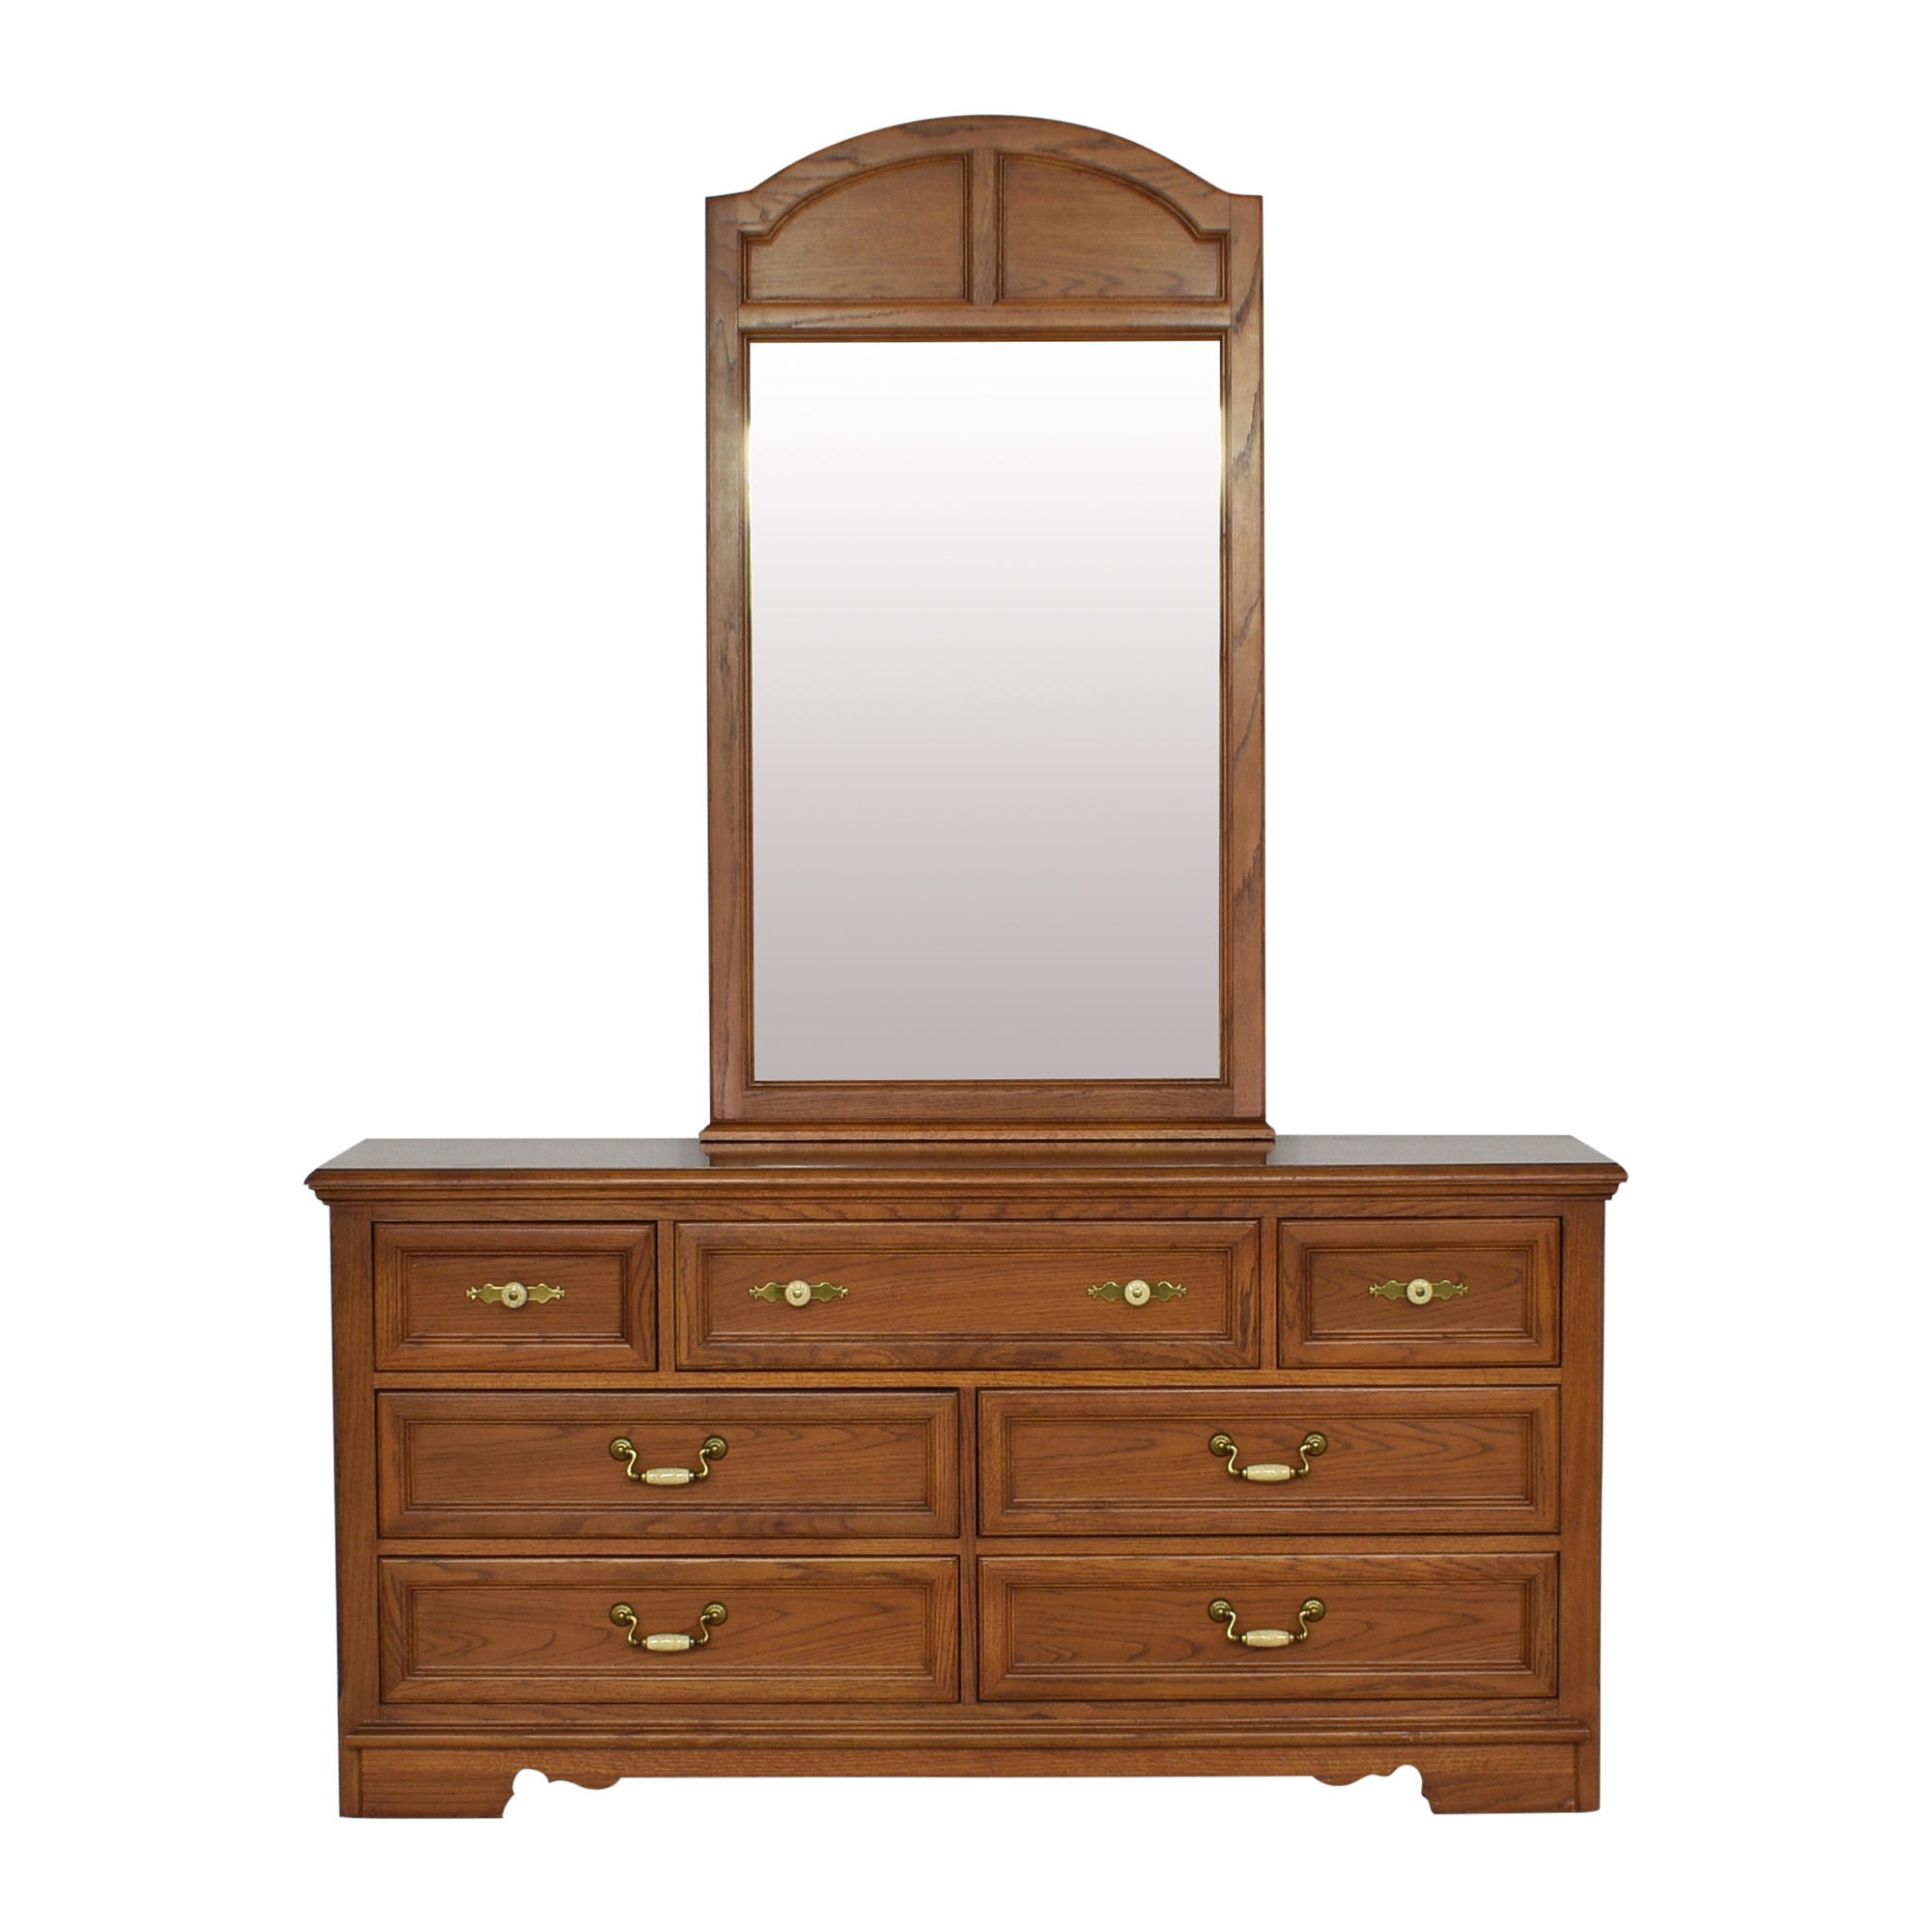 Thomasville Thomasville Homecoming Dresser with Mirror ct